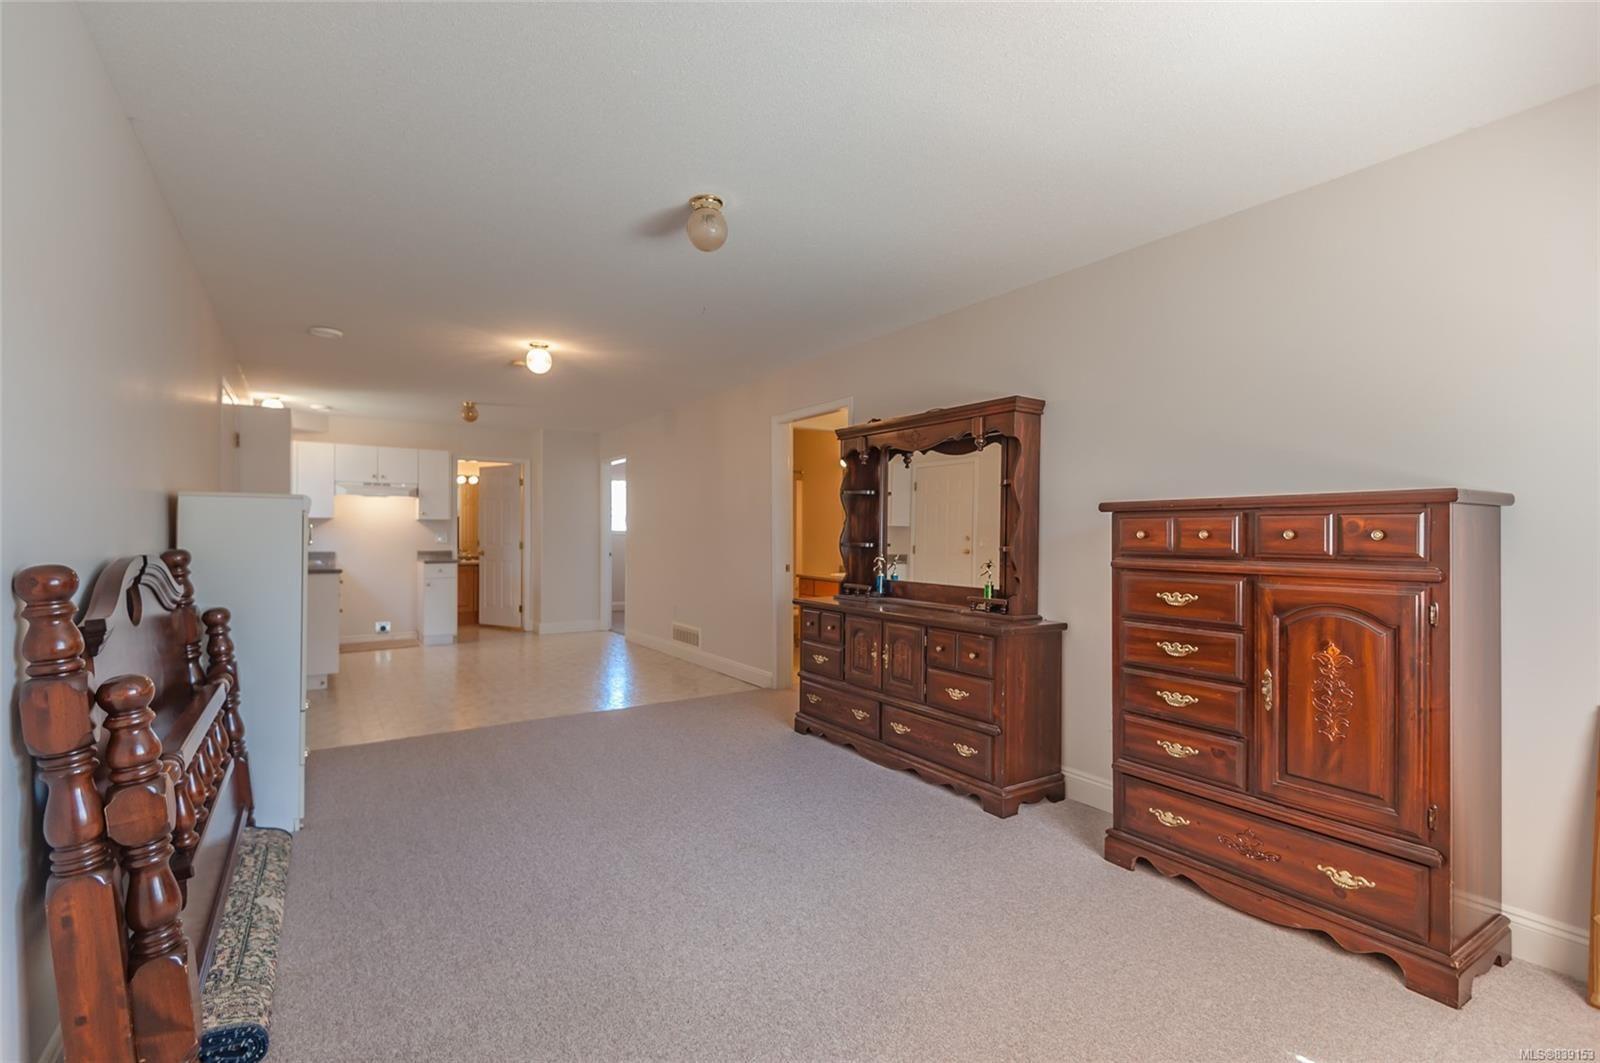 Photo 48: Photos: 6412 Dover Rd in NANAIMO: Na North Nanaimo House for sale (Nanaimo)  : MLS®# 839153